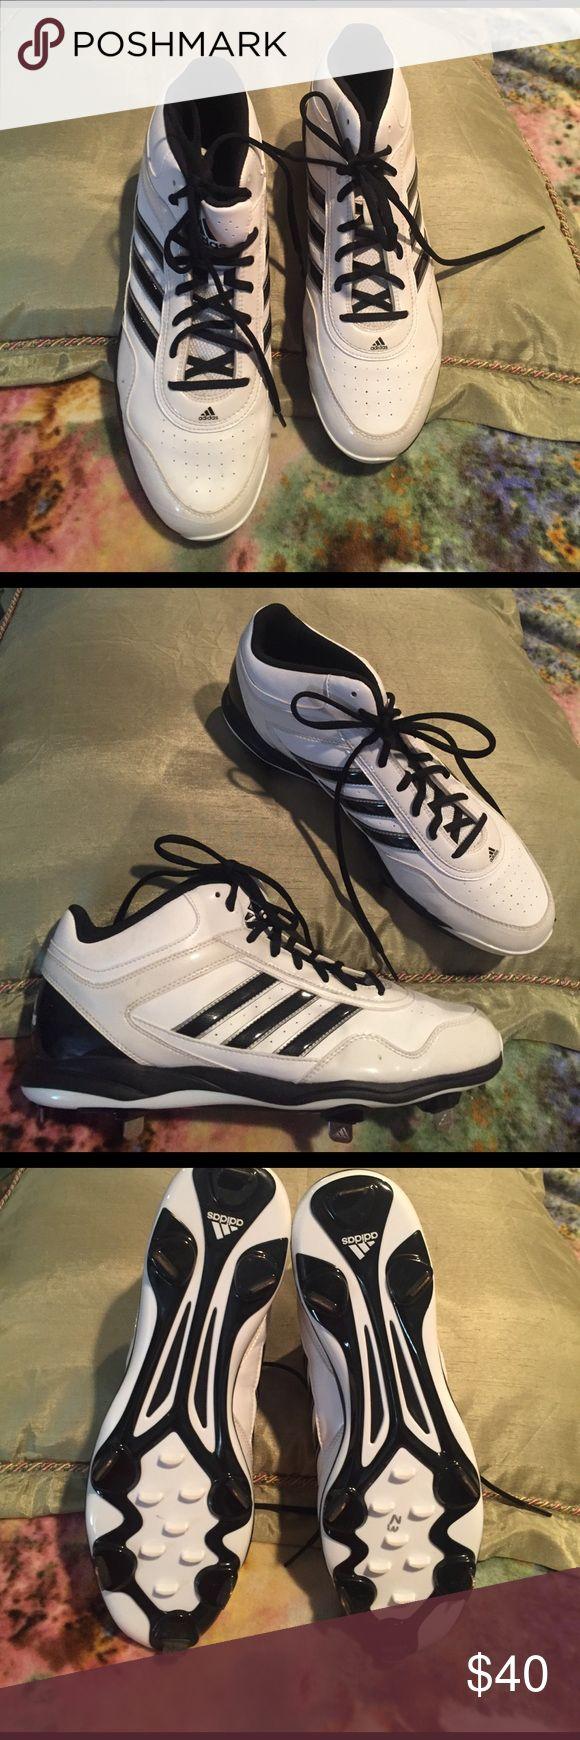 NWOT men's Adidas baseball cleats NWOT men's adidas baseball metal cleats. Excellent condition. Adidas Shoes Athletic Shoes